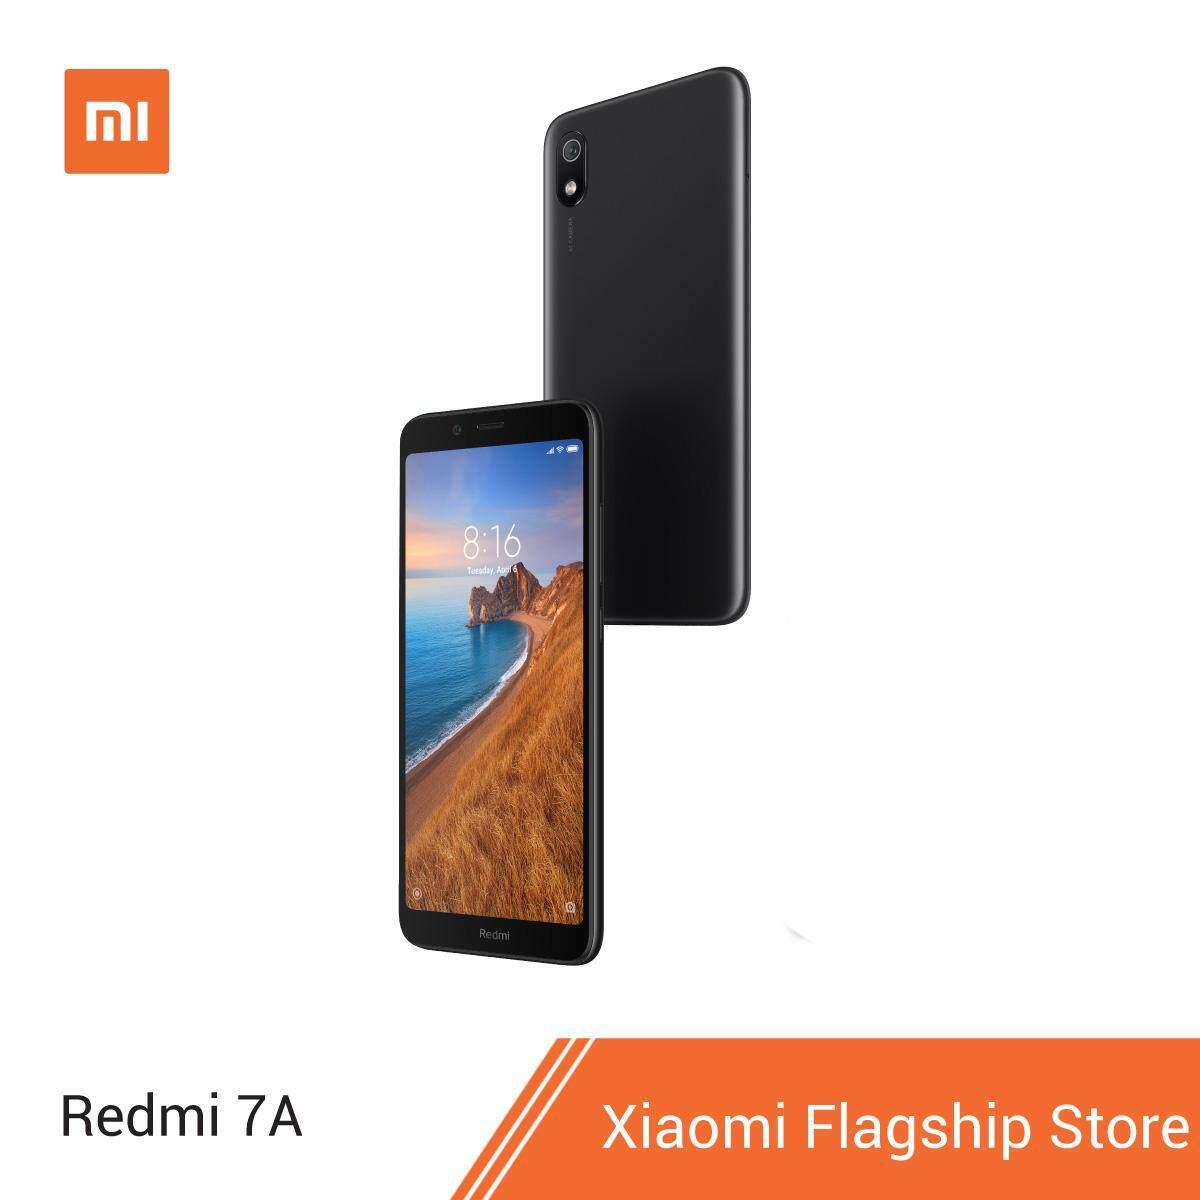 [Pre Order] Xiaomi Redmi 7A (2/32GB) ฟรี! Micro SD Card 32GB เริ่มส่งของวันที่ 11 ก.ค. เป็นต้นไป  - 22650290129a862e126886c6e15ad0cb - เอาไปรวย !! เลขเด็ดรวยทรัพย์ งวดวันที่ 15 กรกฎาคม 2562 ขอให้โชคดี-เลขเด็ด งวดนี้